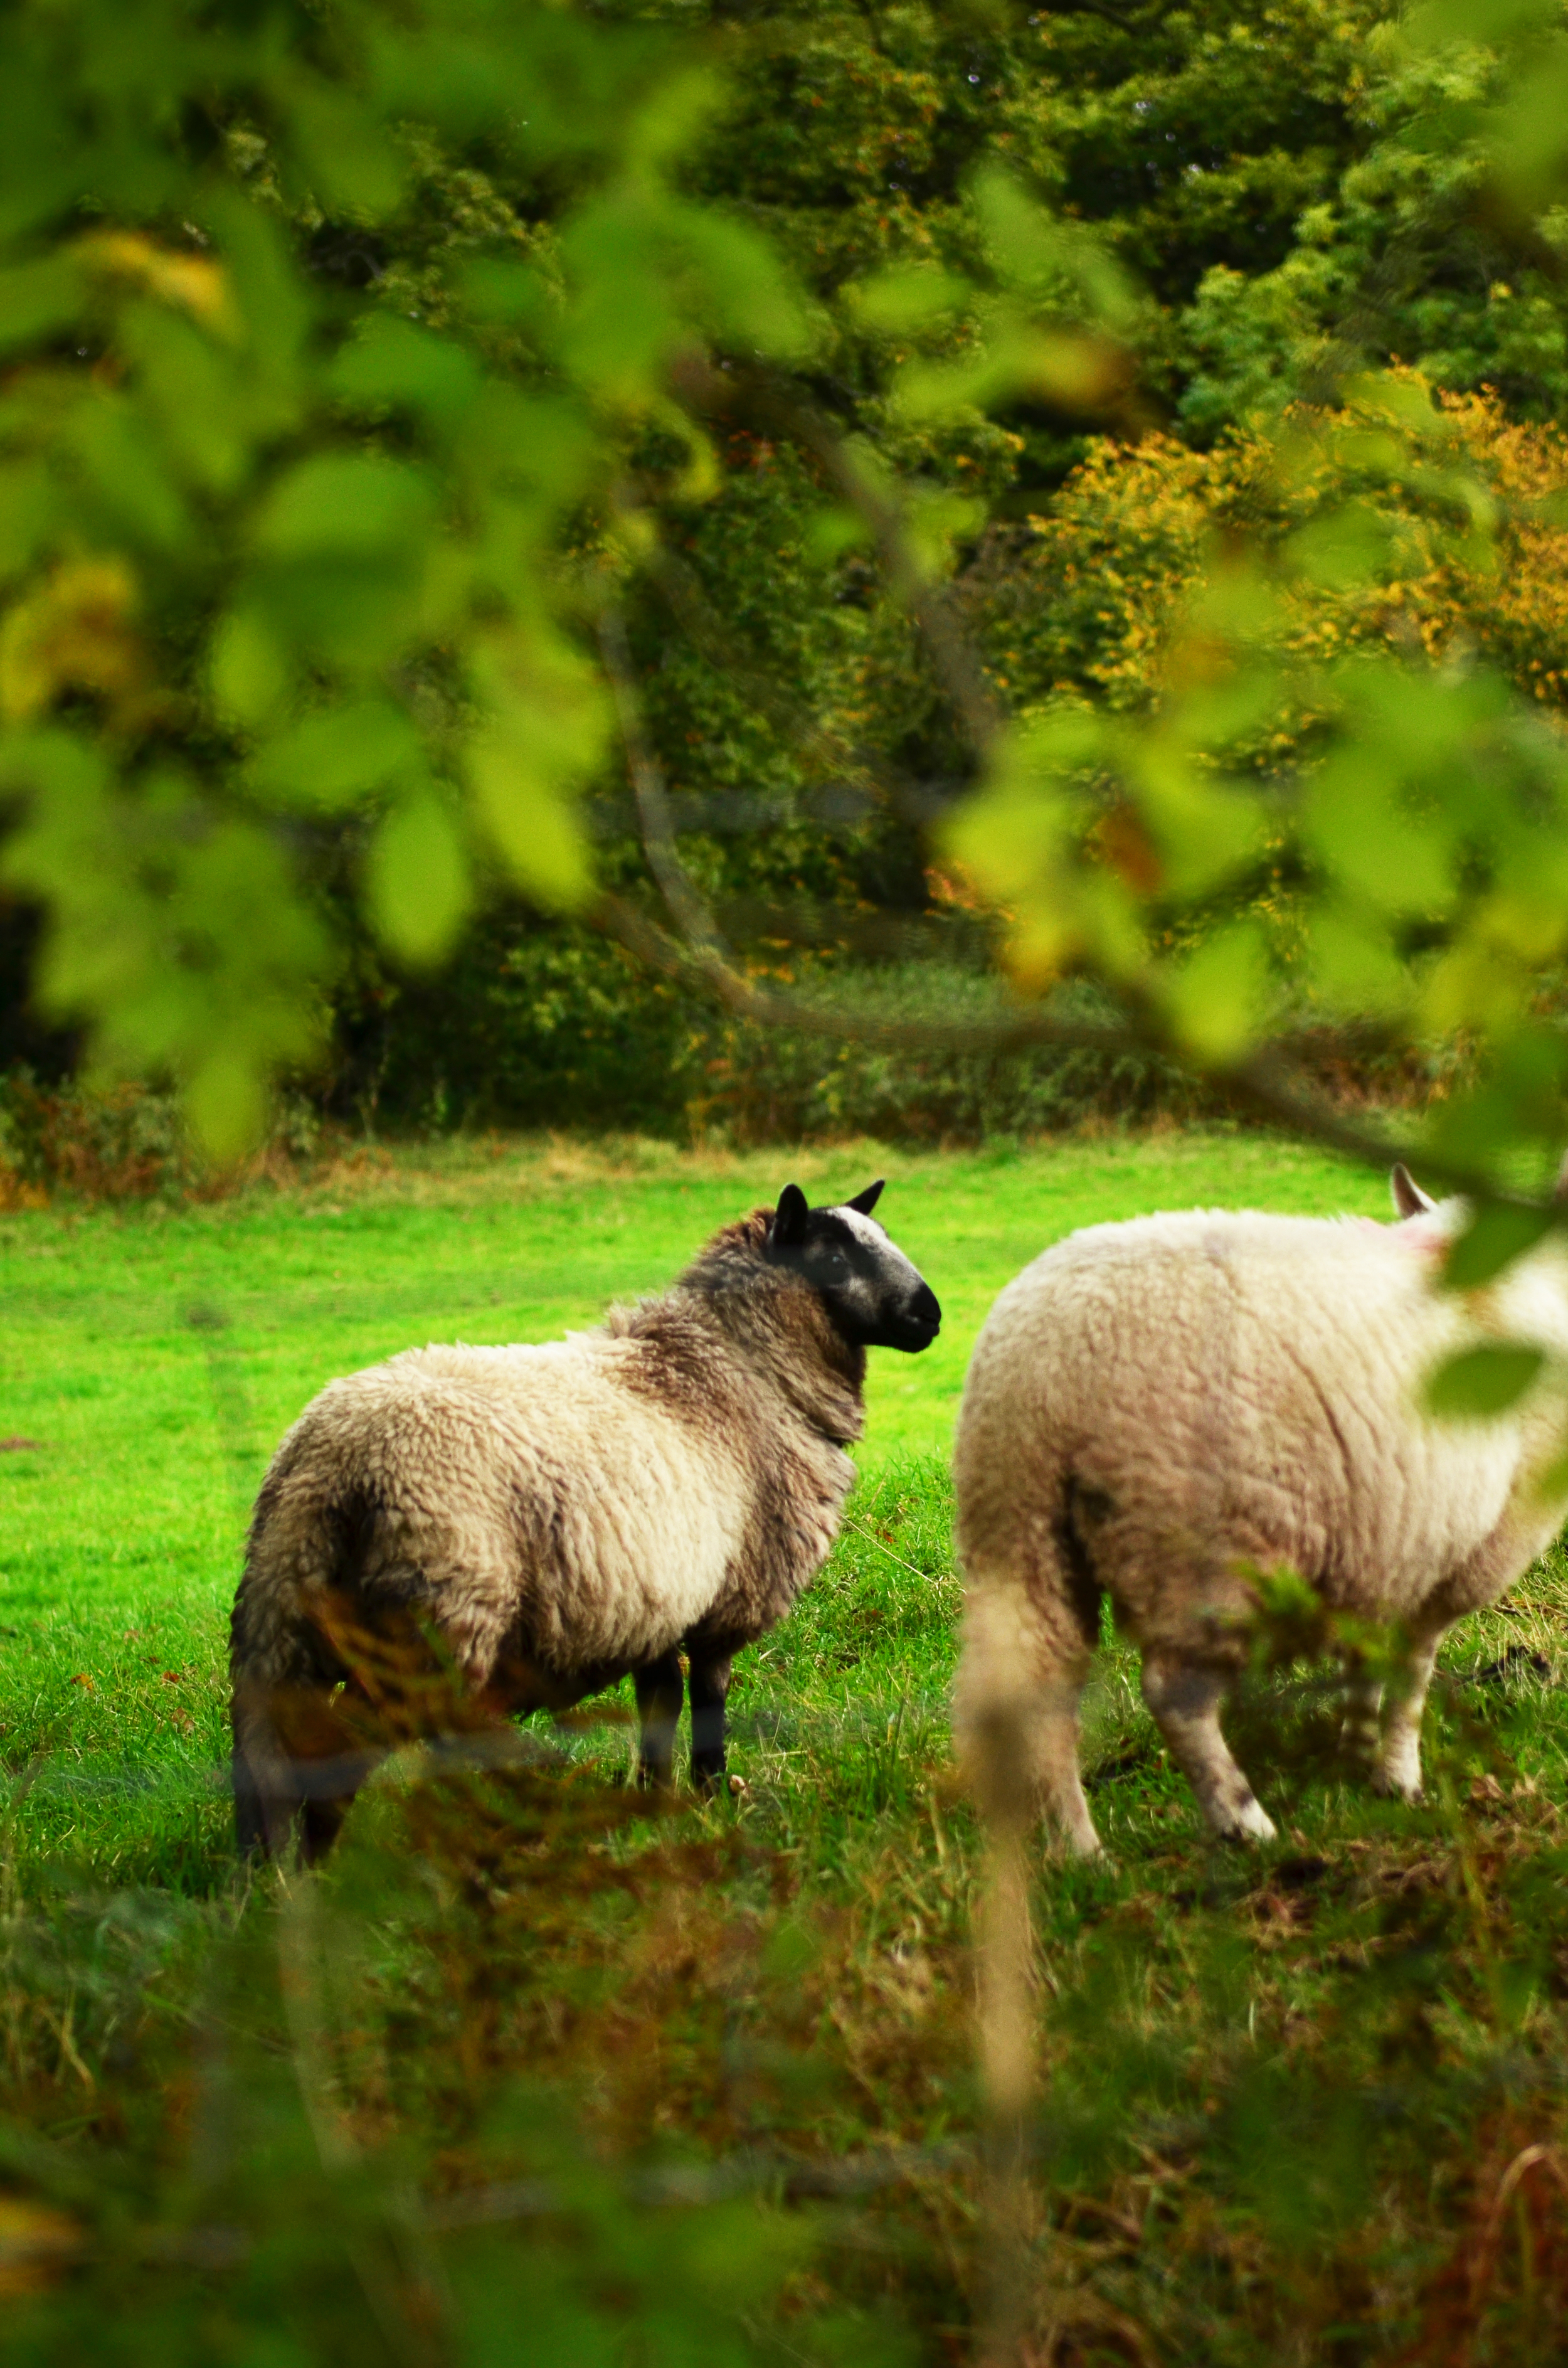 Dark Sheep